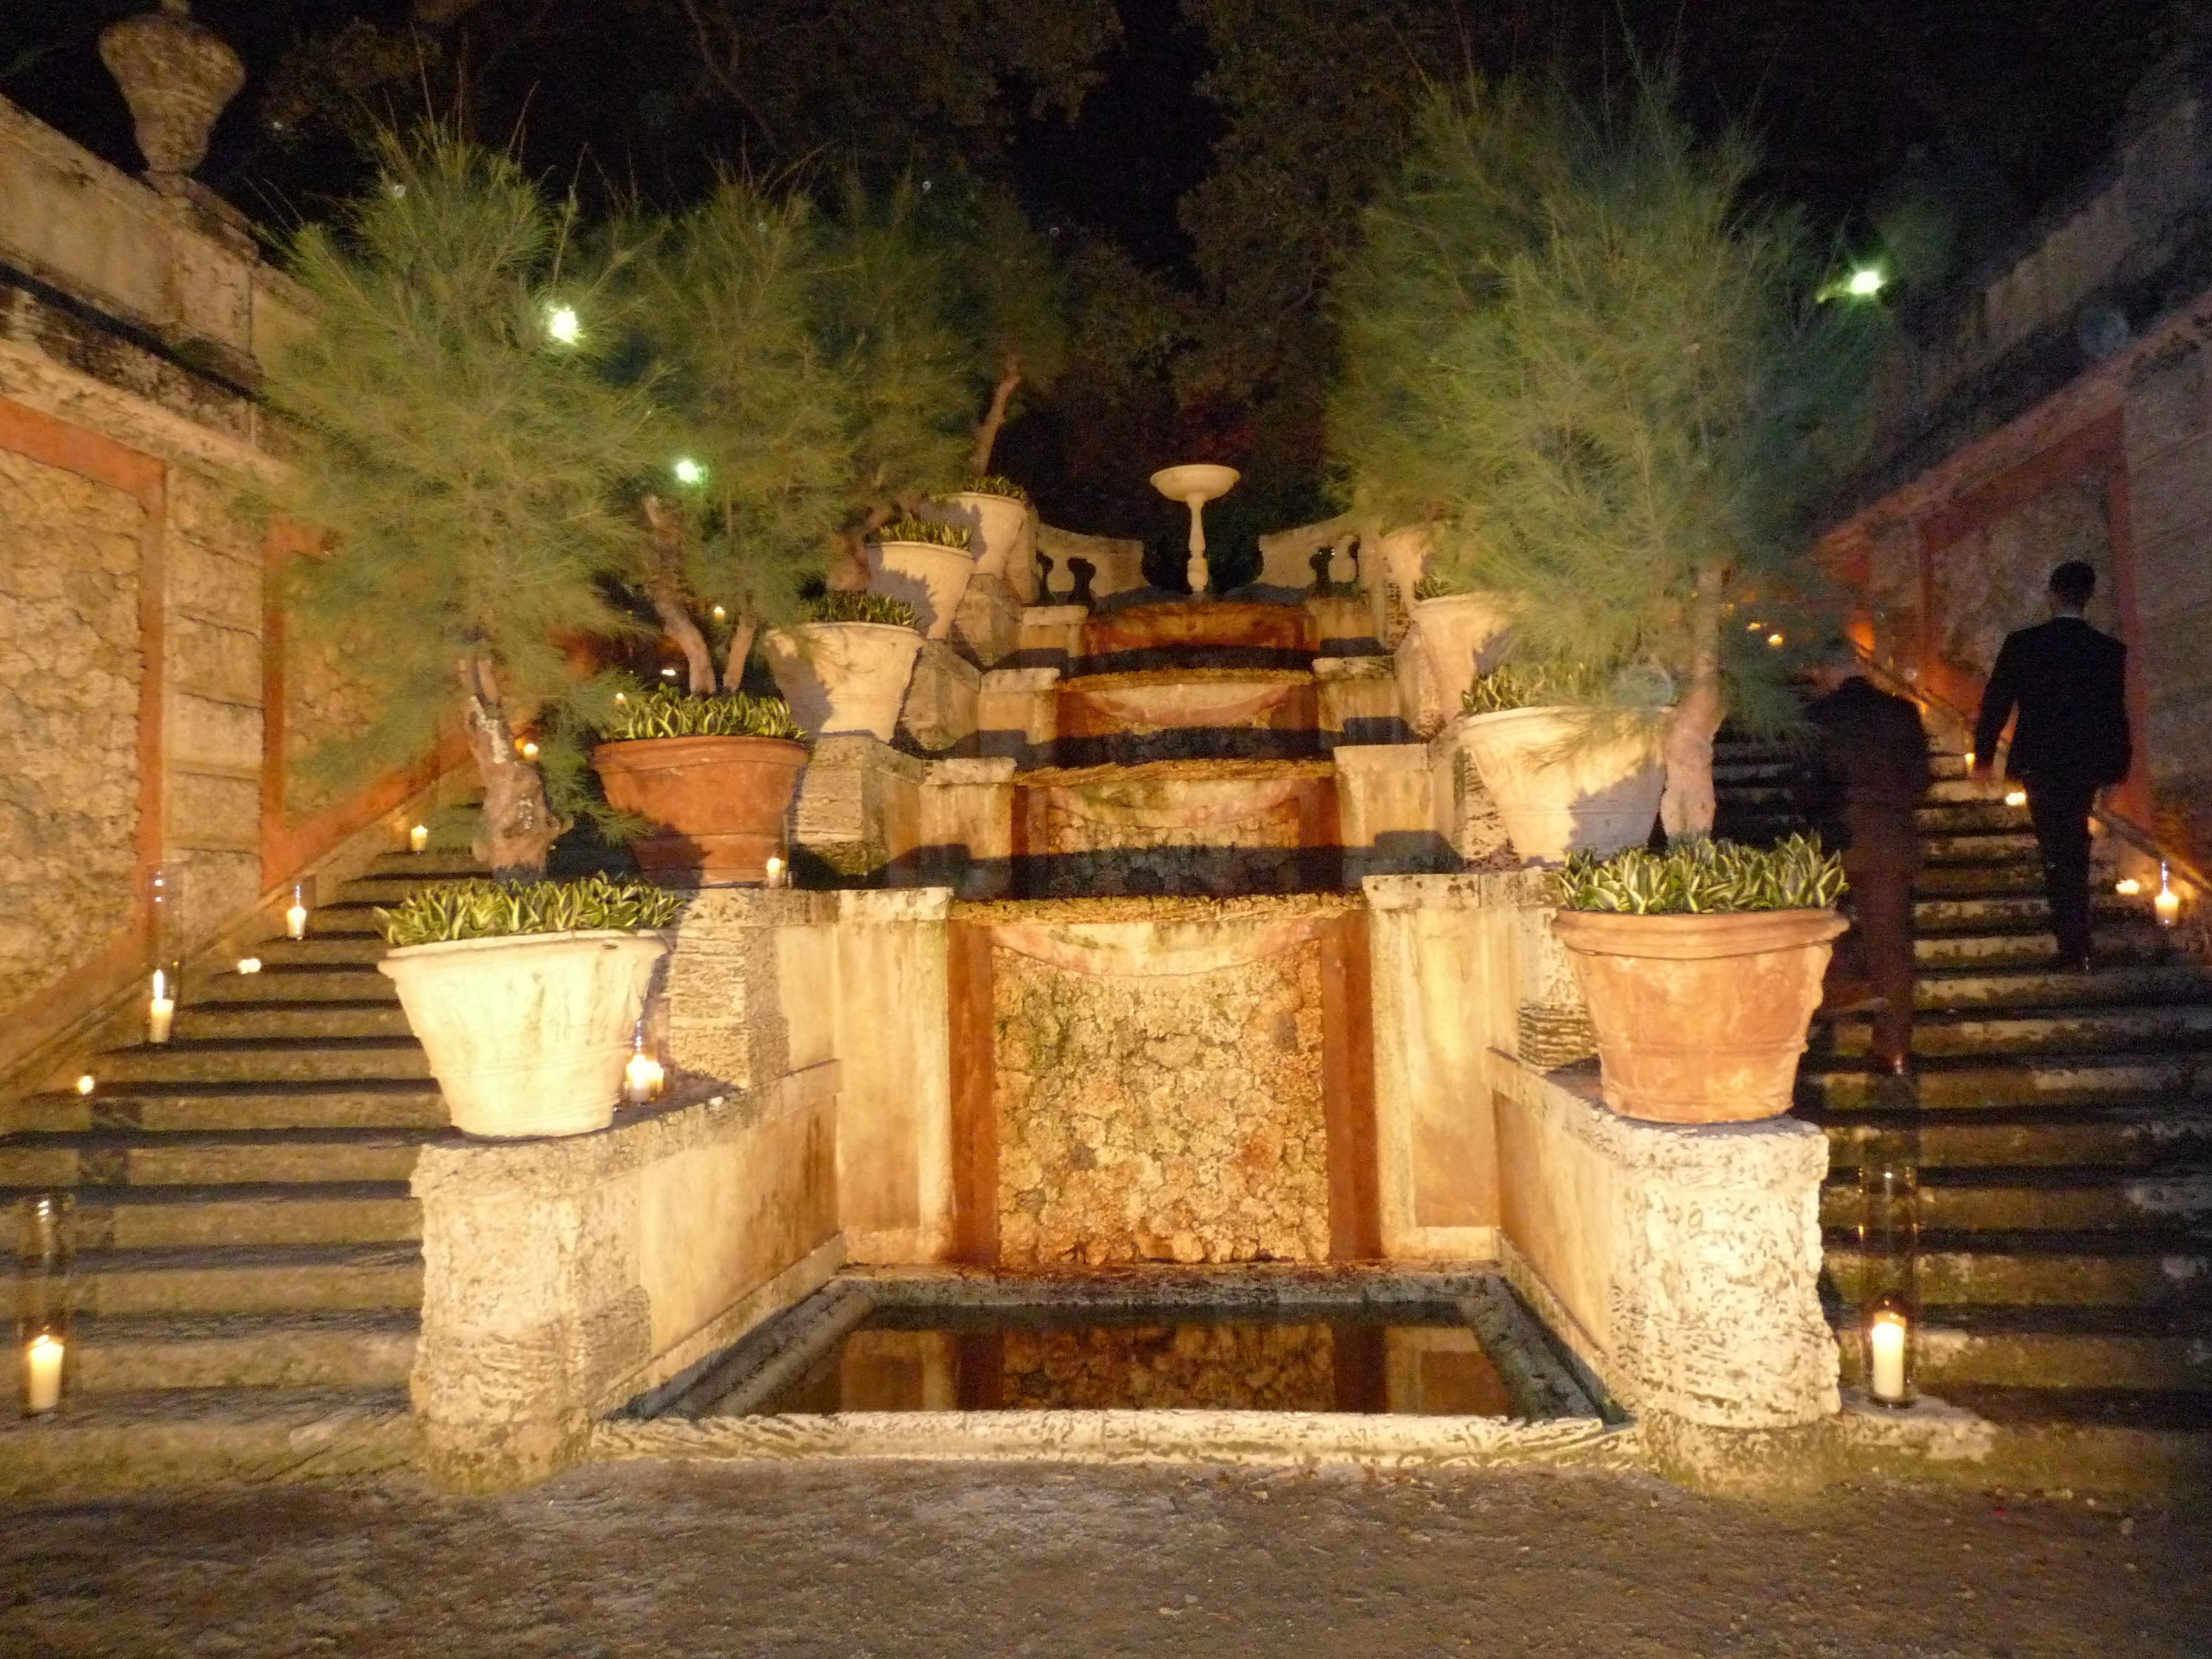 HISTORIC HOUSE TOUR: Come See the Gardens at Miami\'s Vizcaya - Decor ...